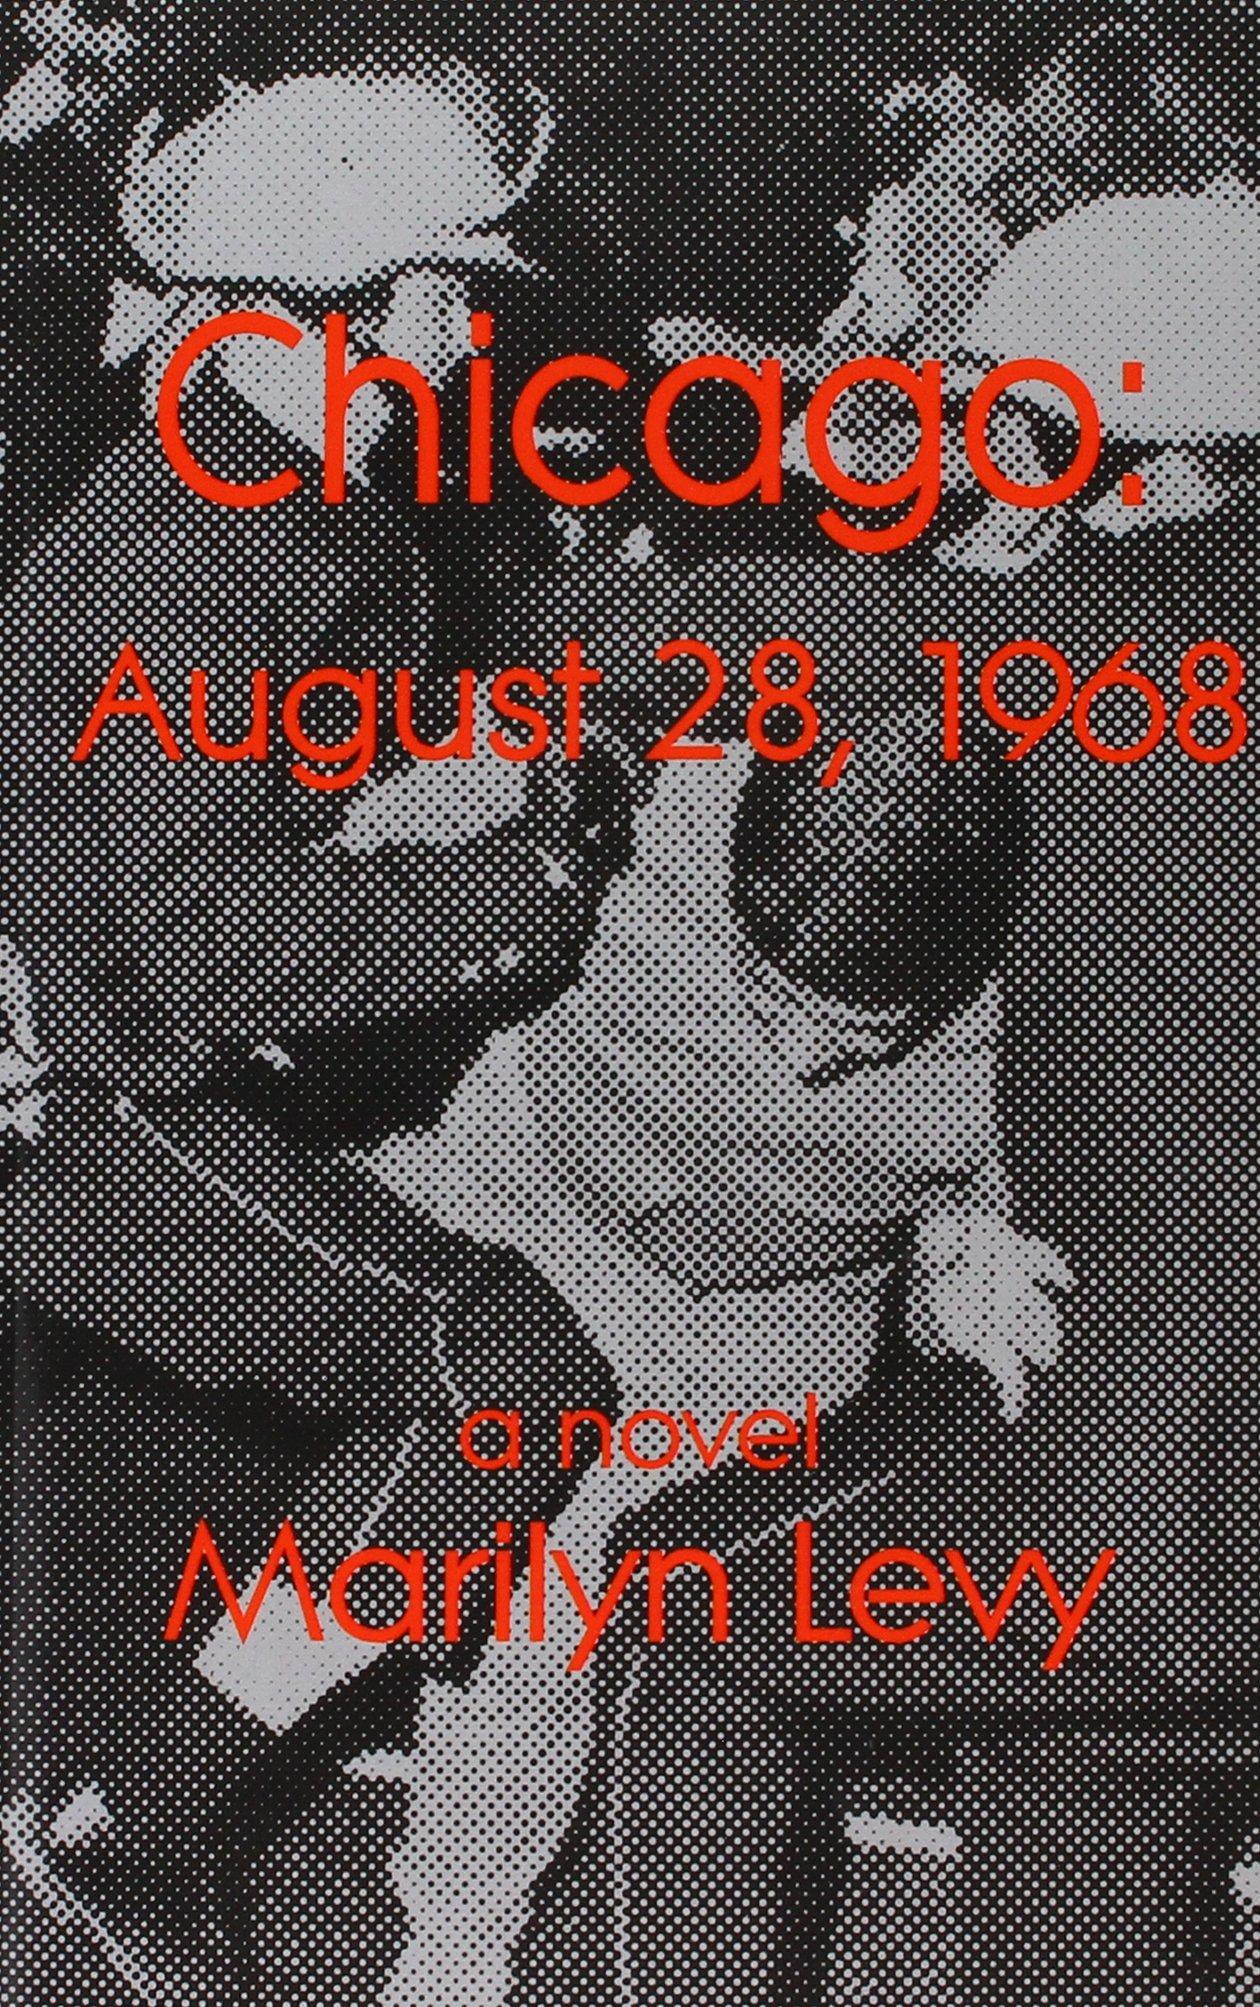 Download Chicago: August 28, 1968 pdf epub